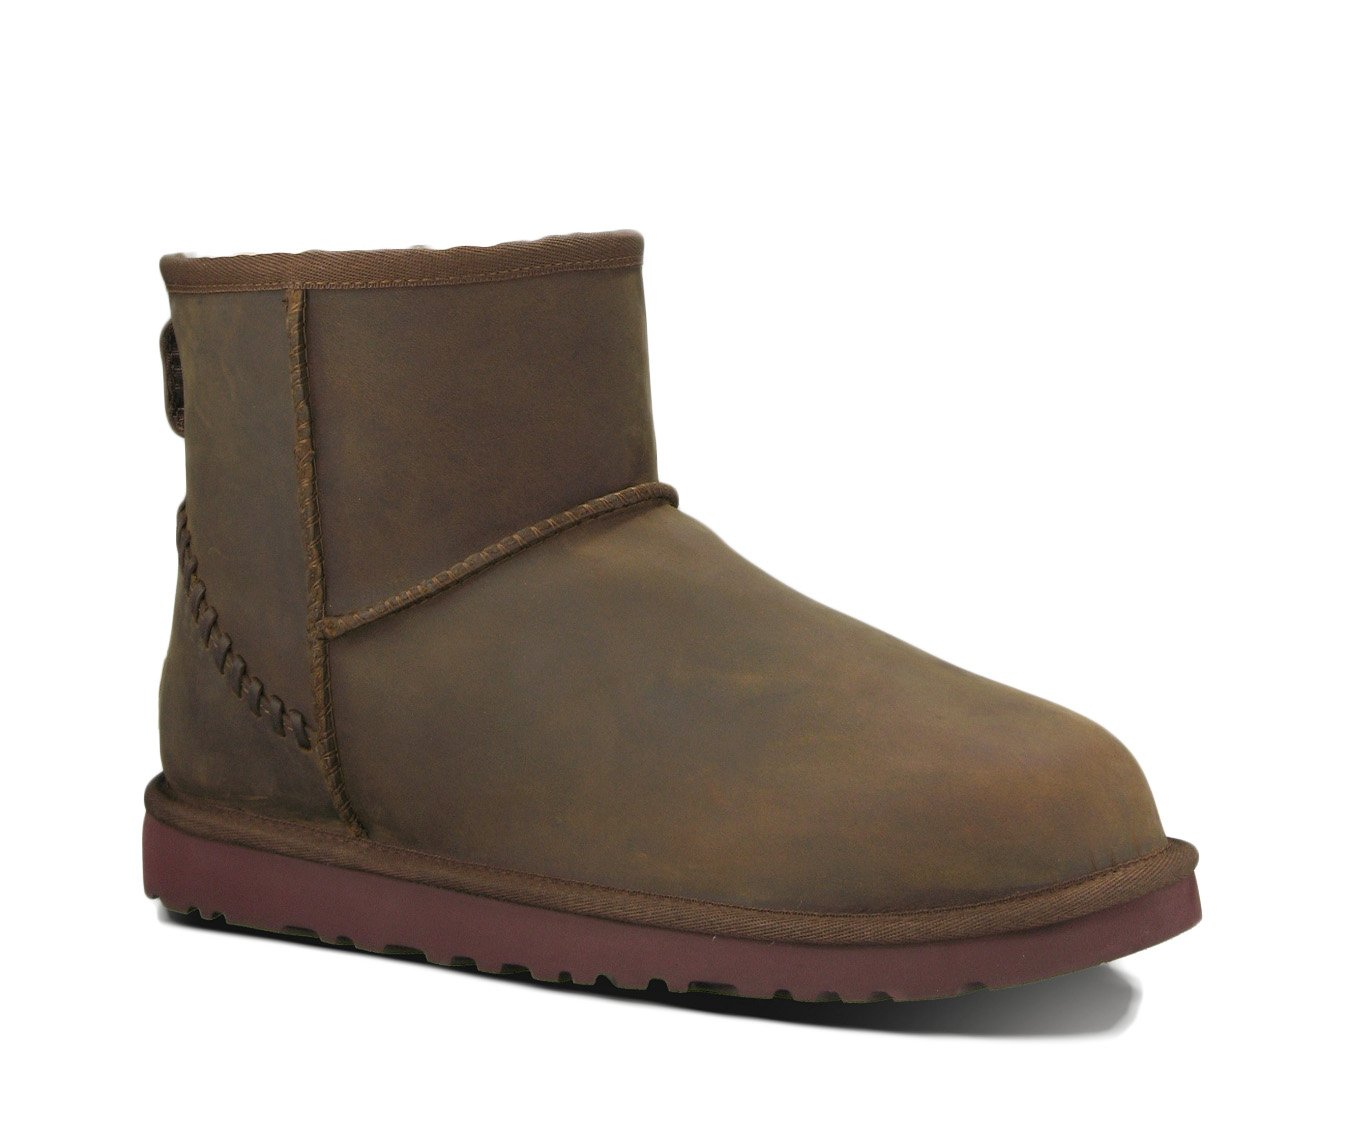 UGG Men's Classic Mini Deco Chestnut Leather Boot 9 D (M)